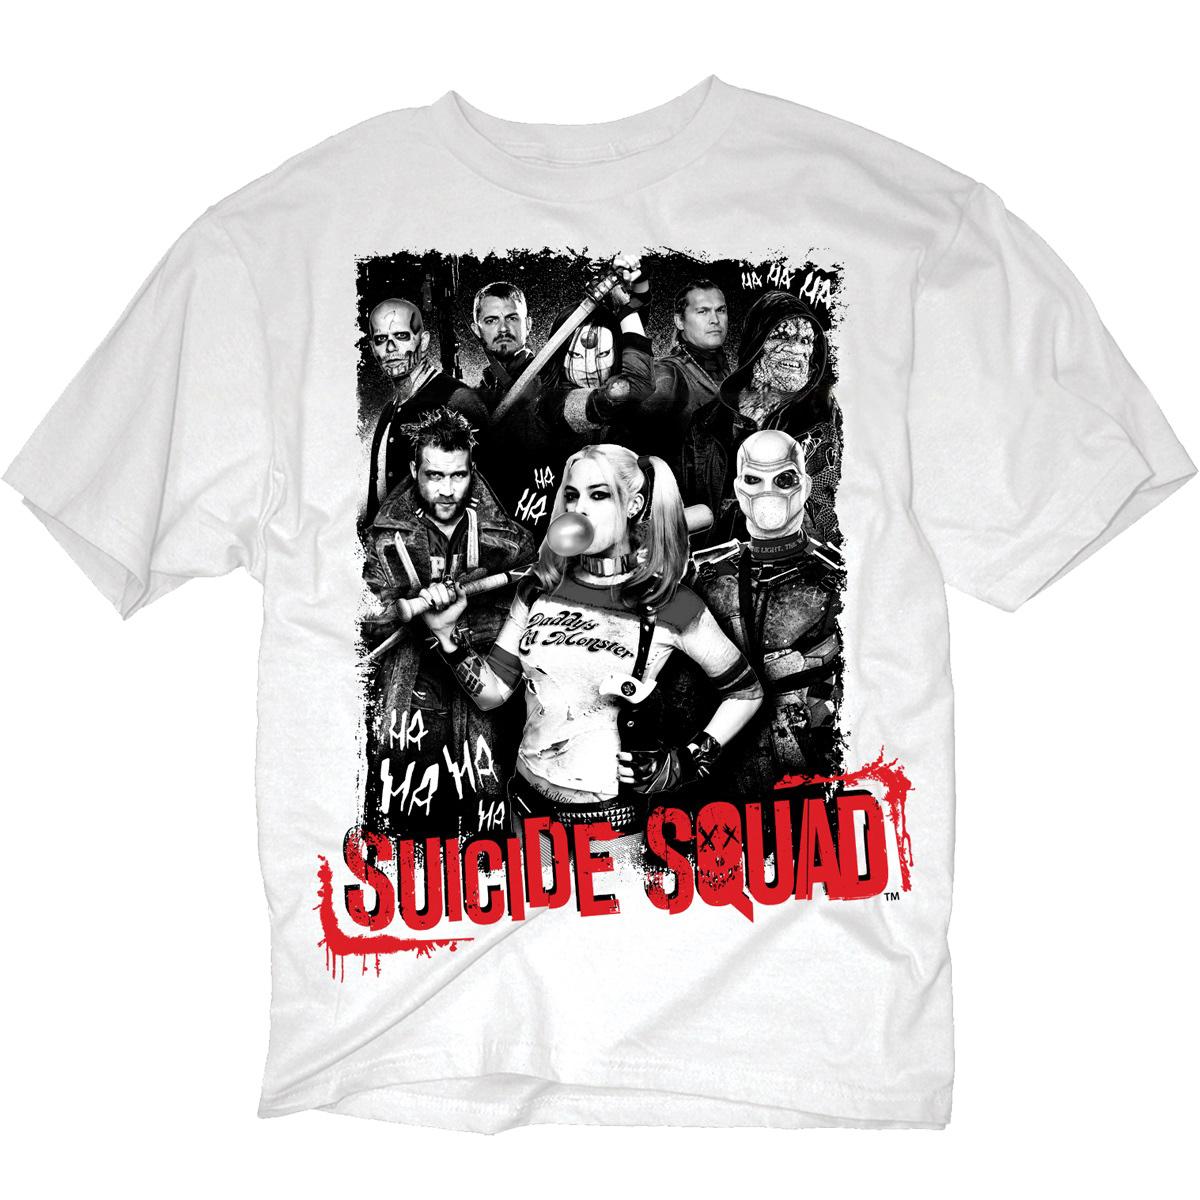 Suicide-Squad-Group-Shot-Adult-White-T-shirt-48-301-H30__70102.1469807146.1280.1280